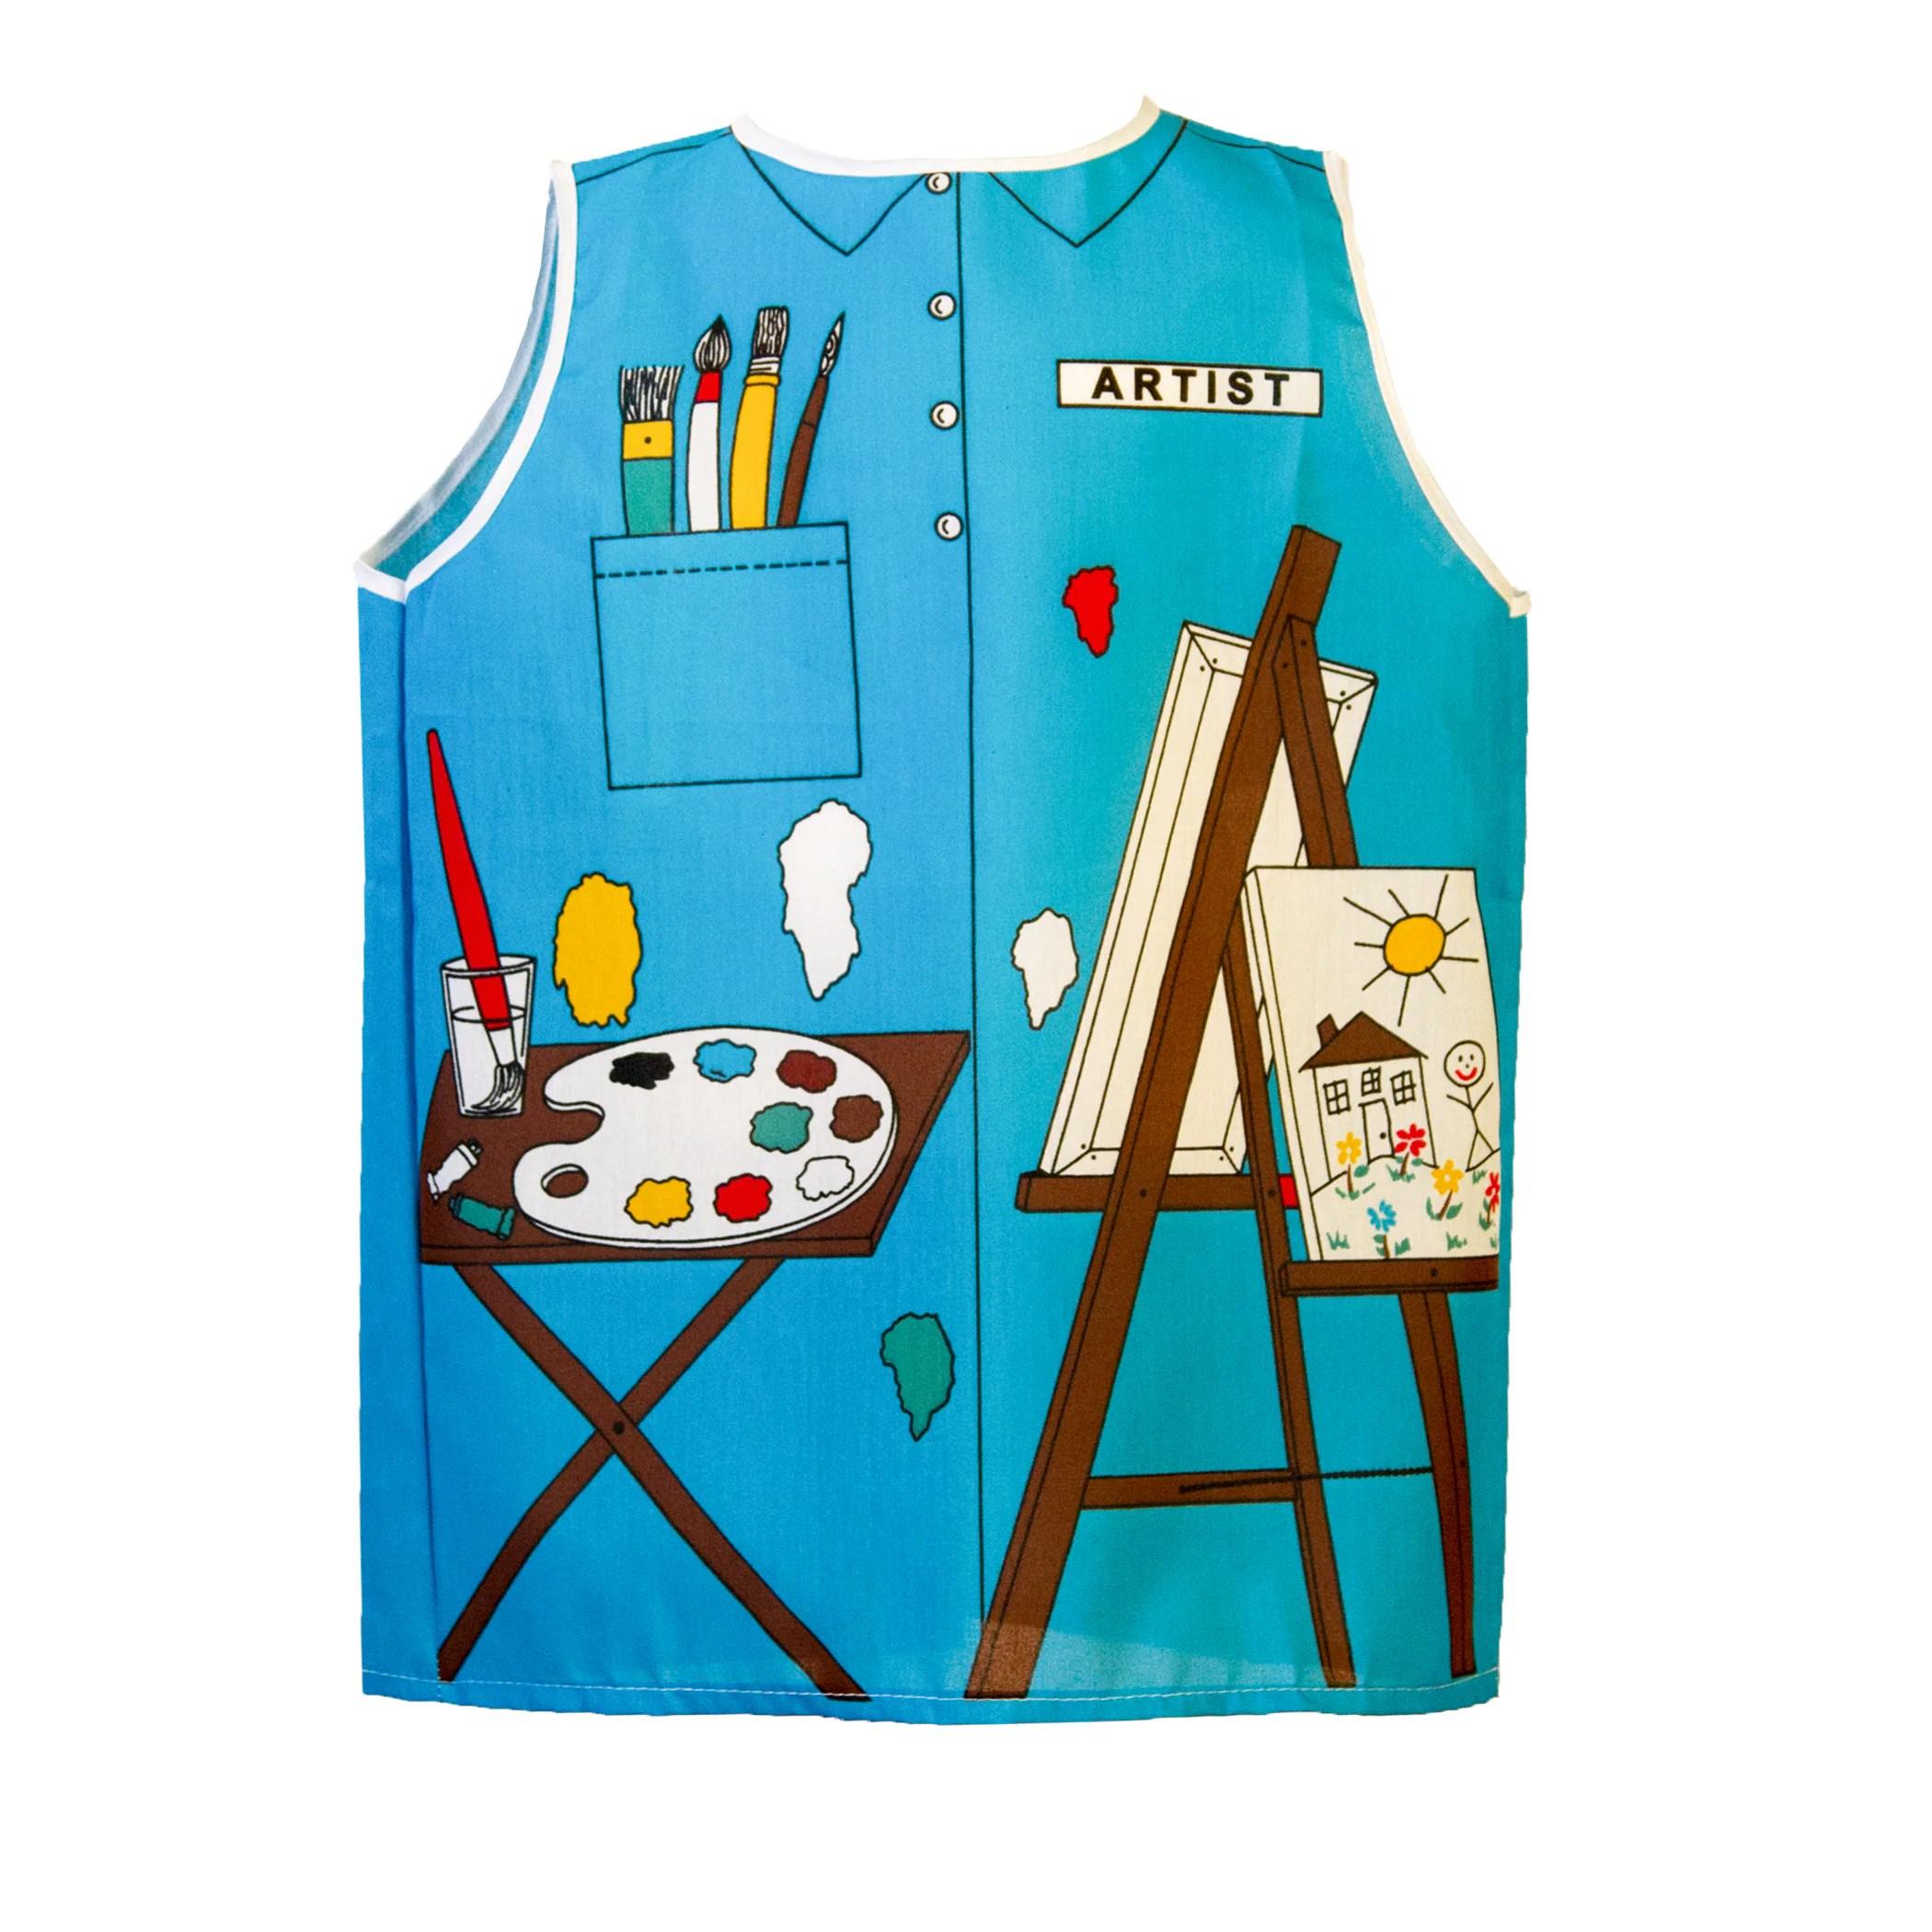 Dexter Educational Play Artist Costume